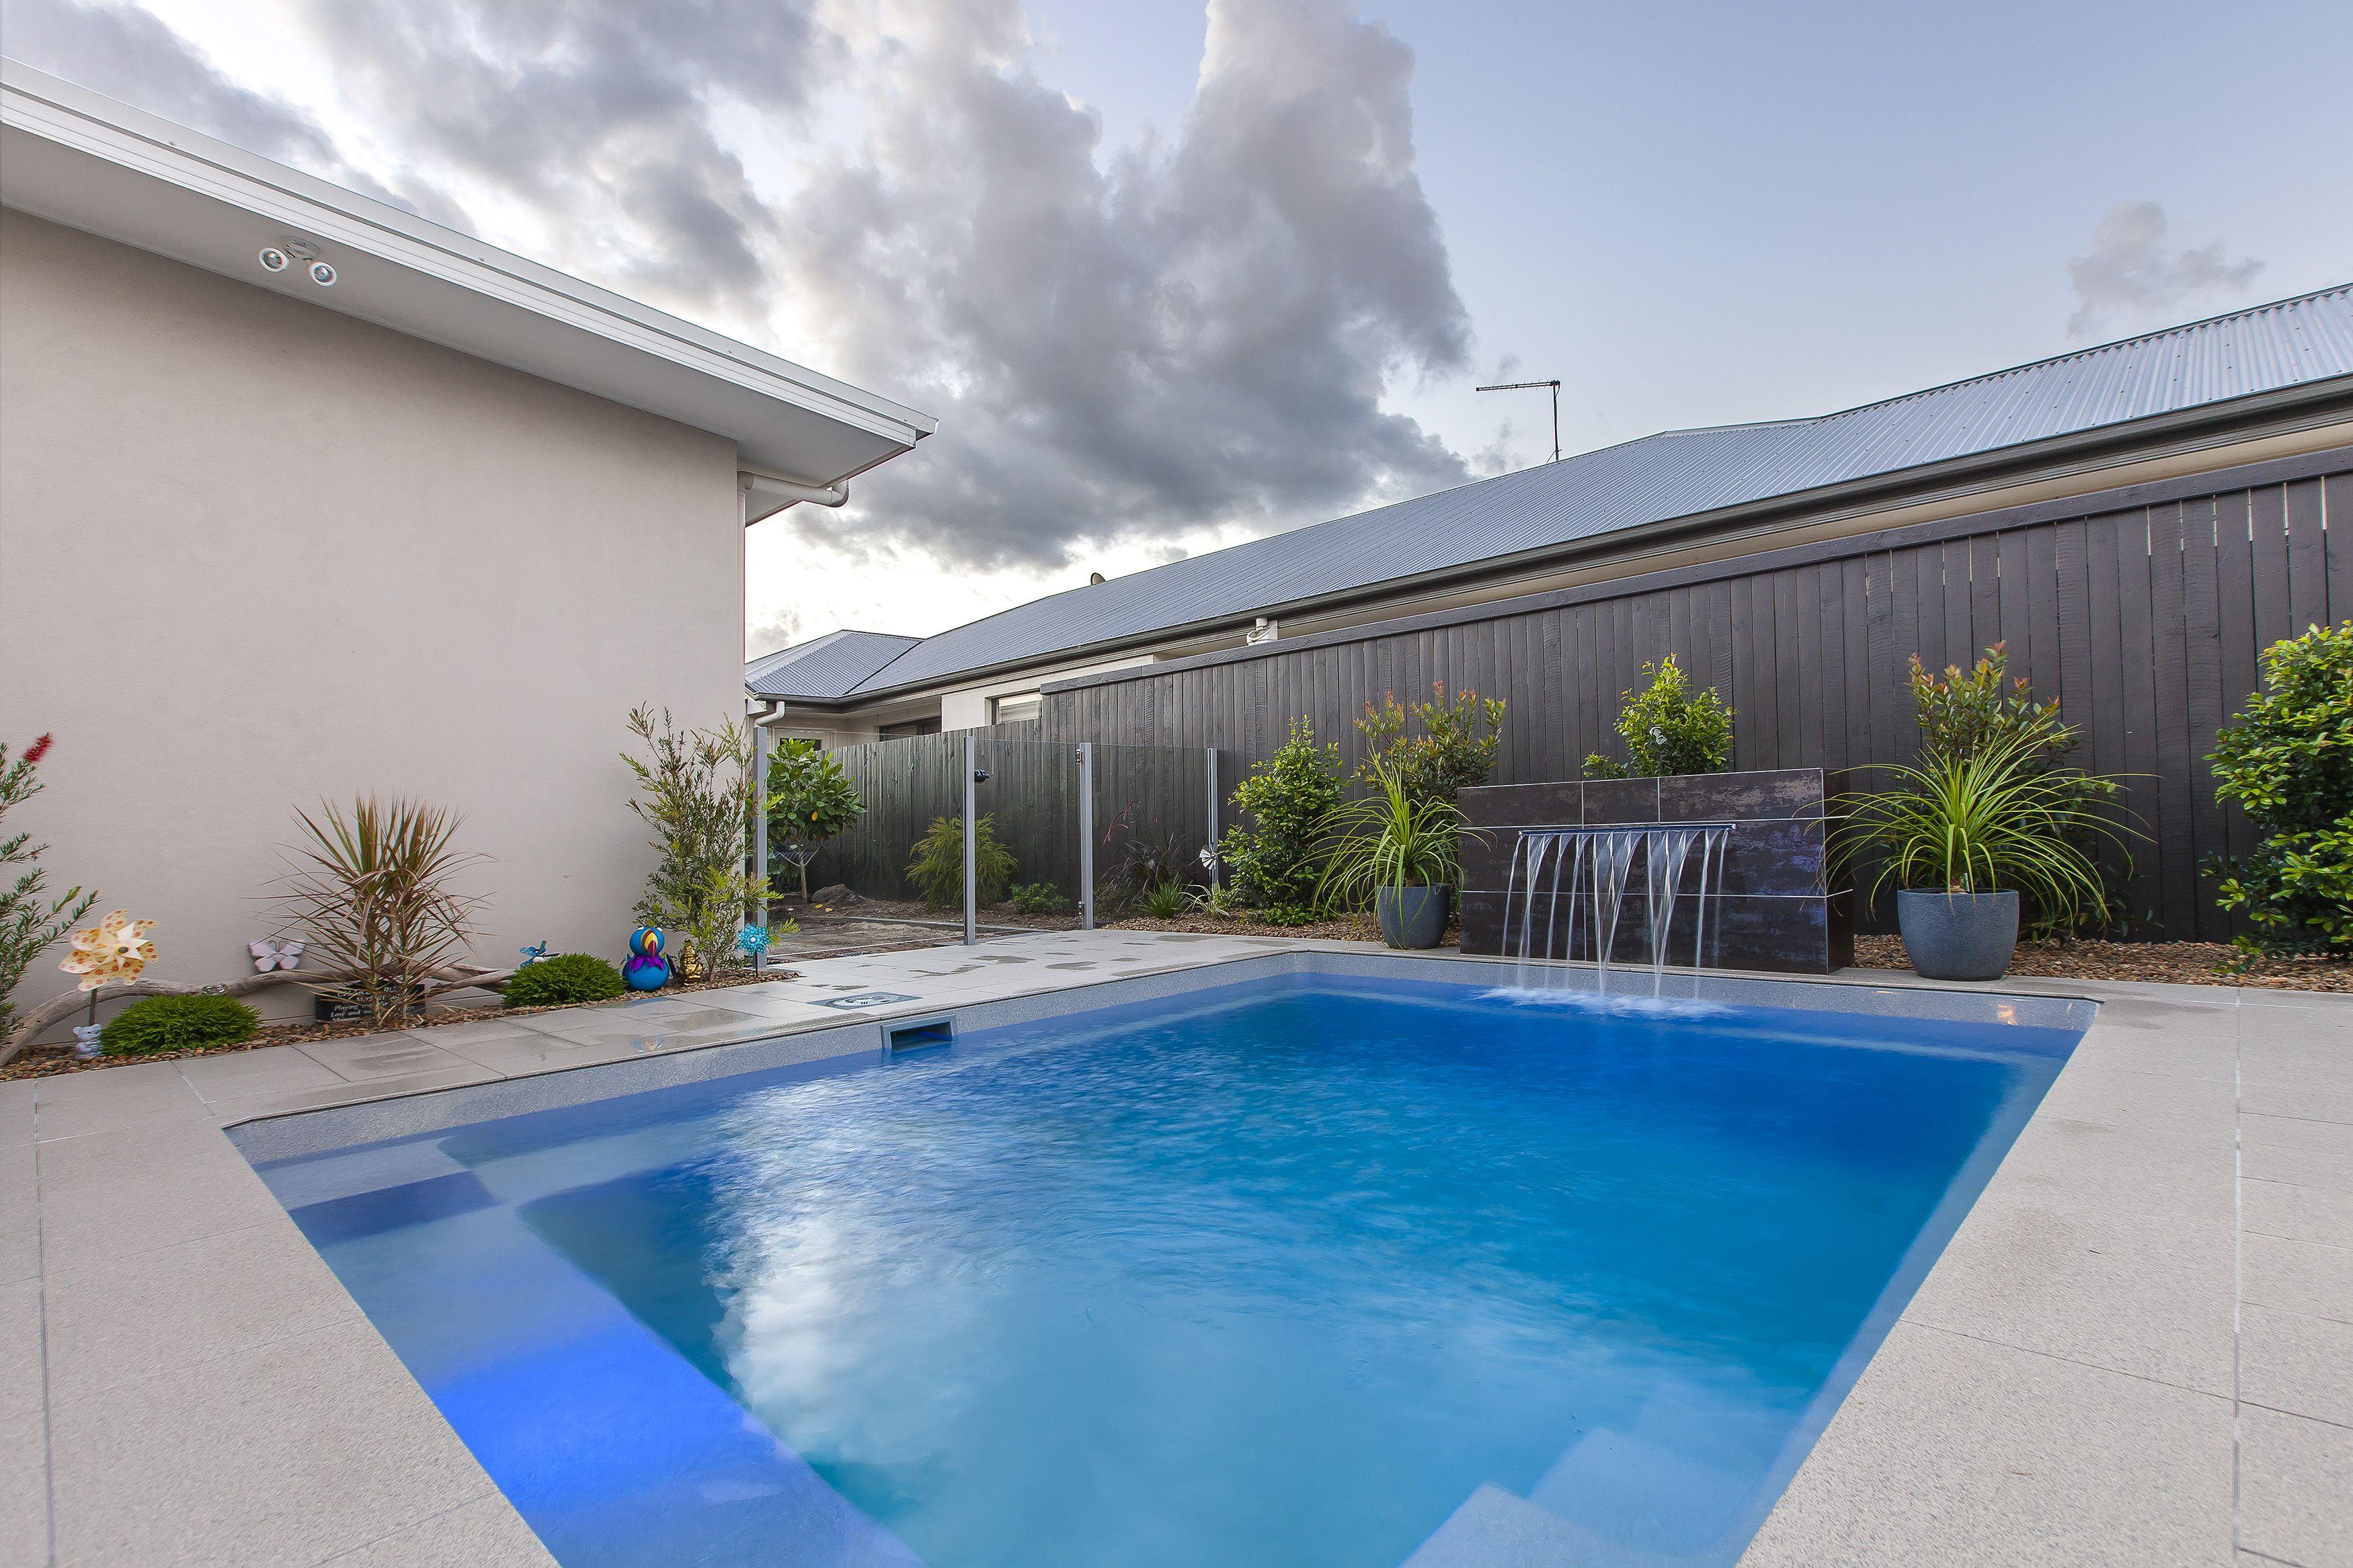 Narellan Pools Eden Pool In Grey Quartz #Narellanpoolsinspiration